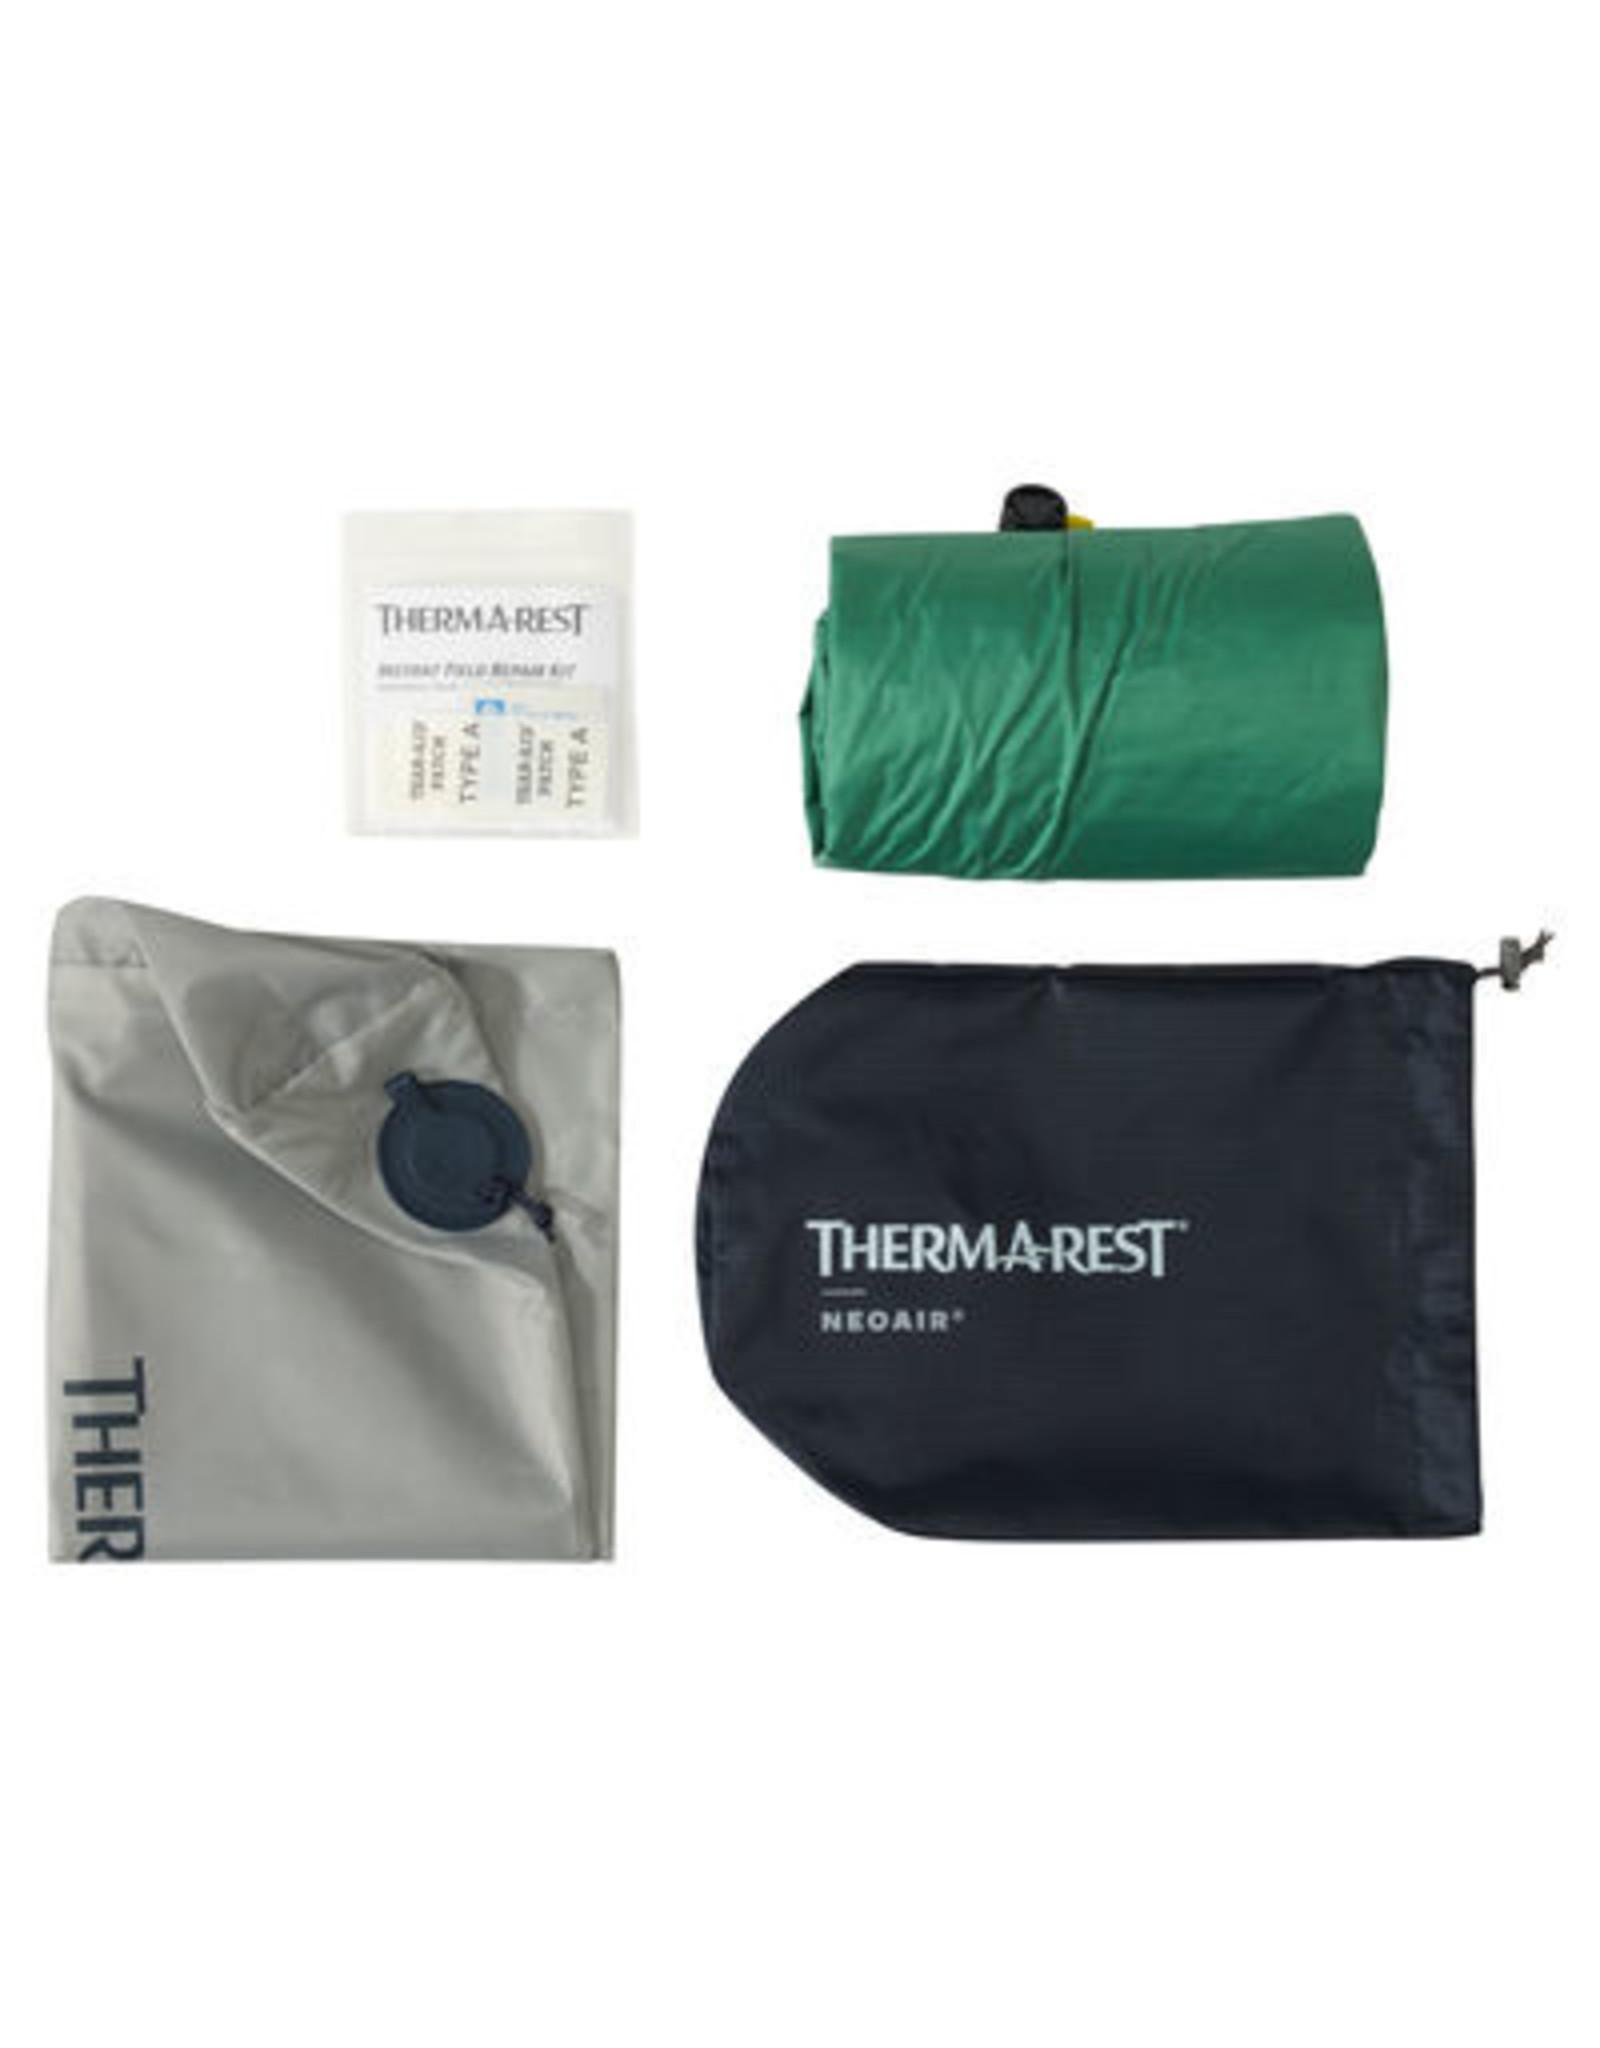 Therm-a-Rest Therm-a-Rest NeoAir Venture Pine Reg